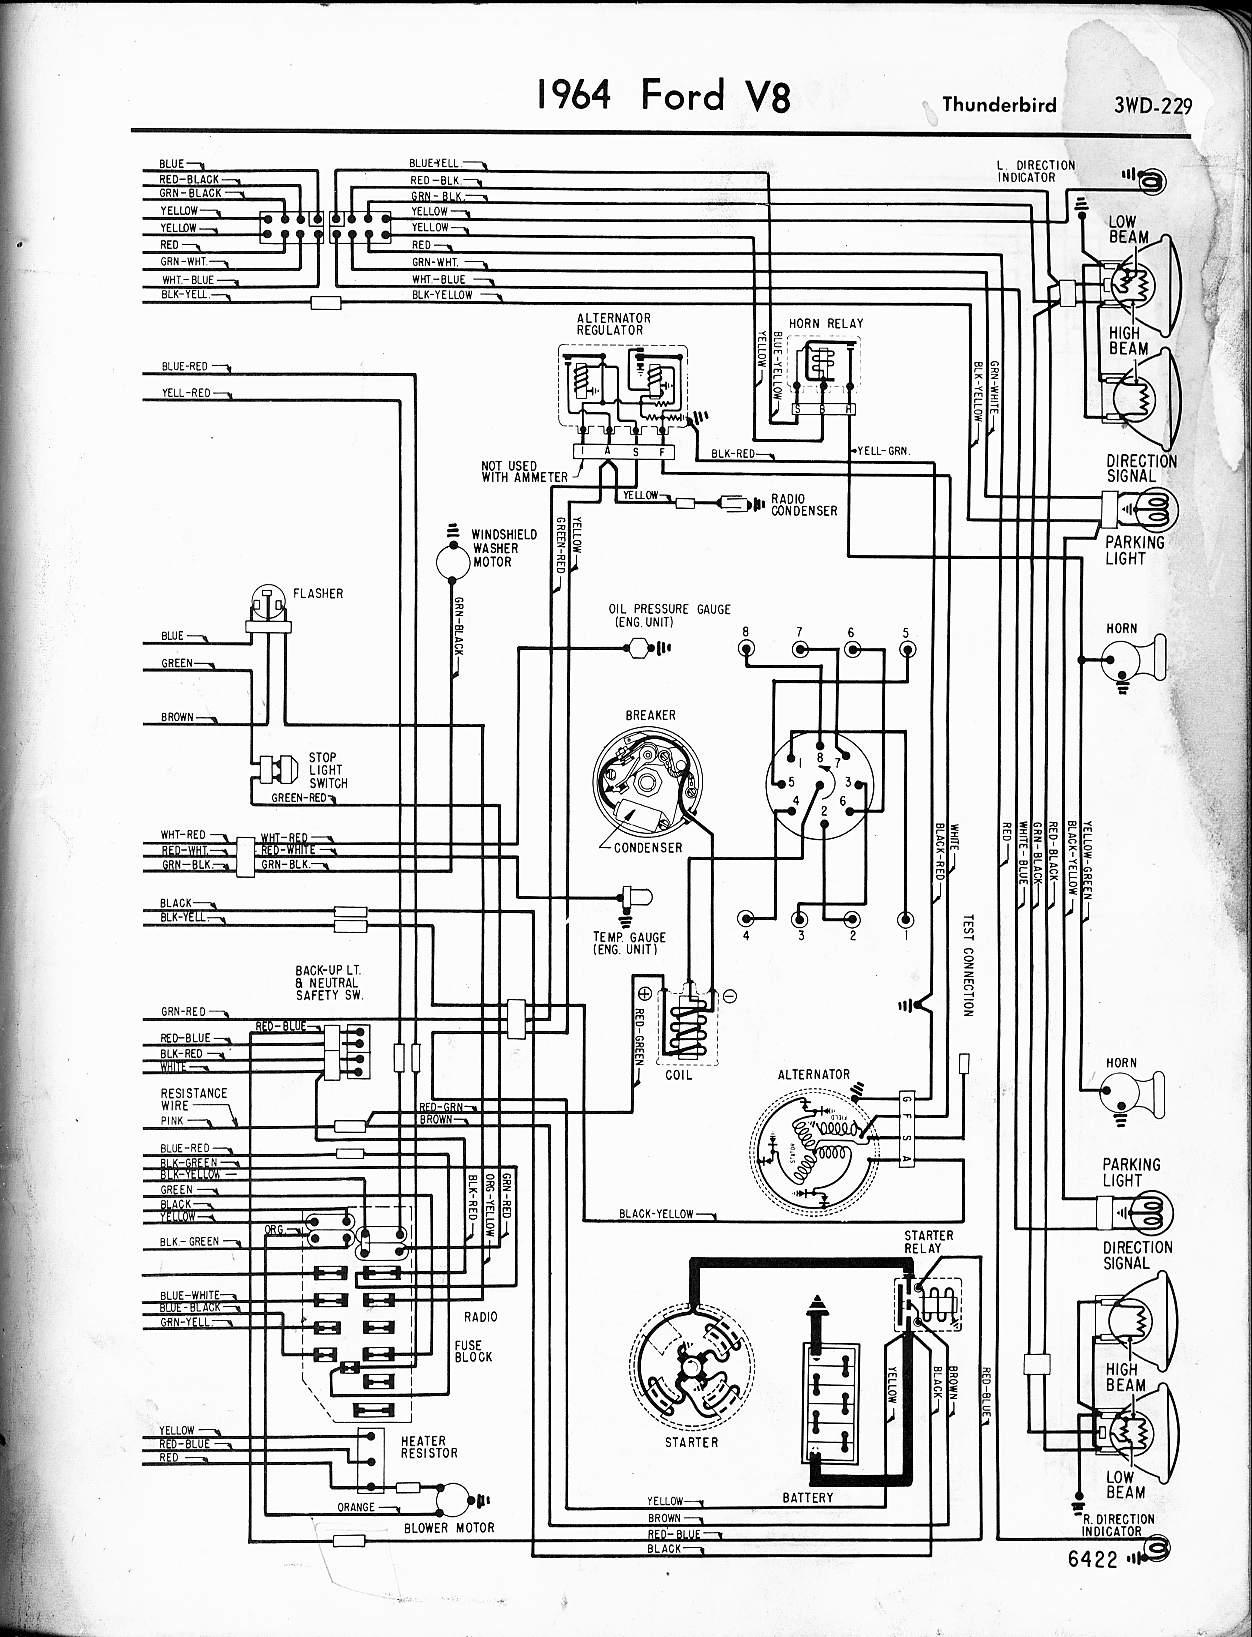 1964 ford galaxie 500 wiring diagram jetta gl fuse box,1964 Galaxie 500 Radio Wiring Diagram